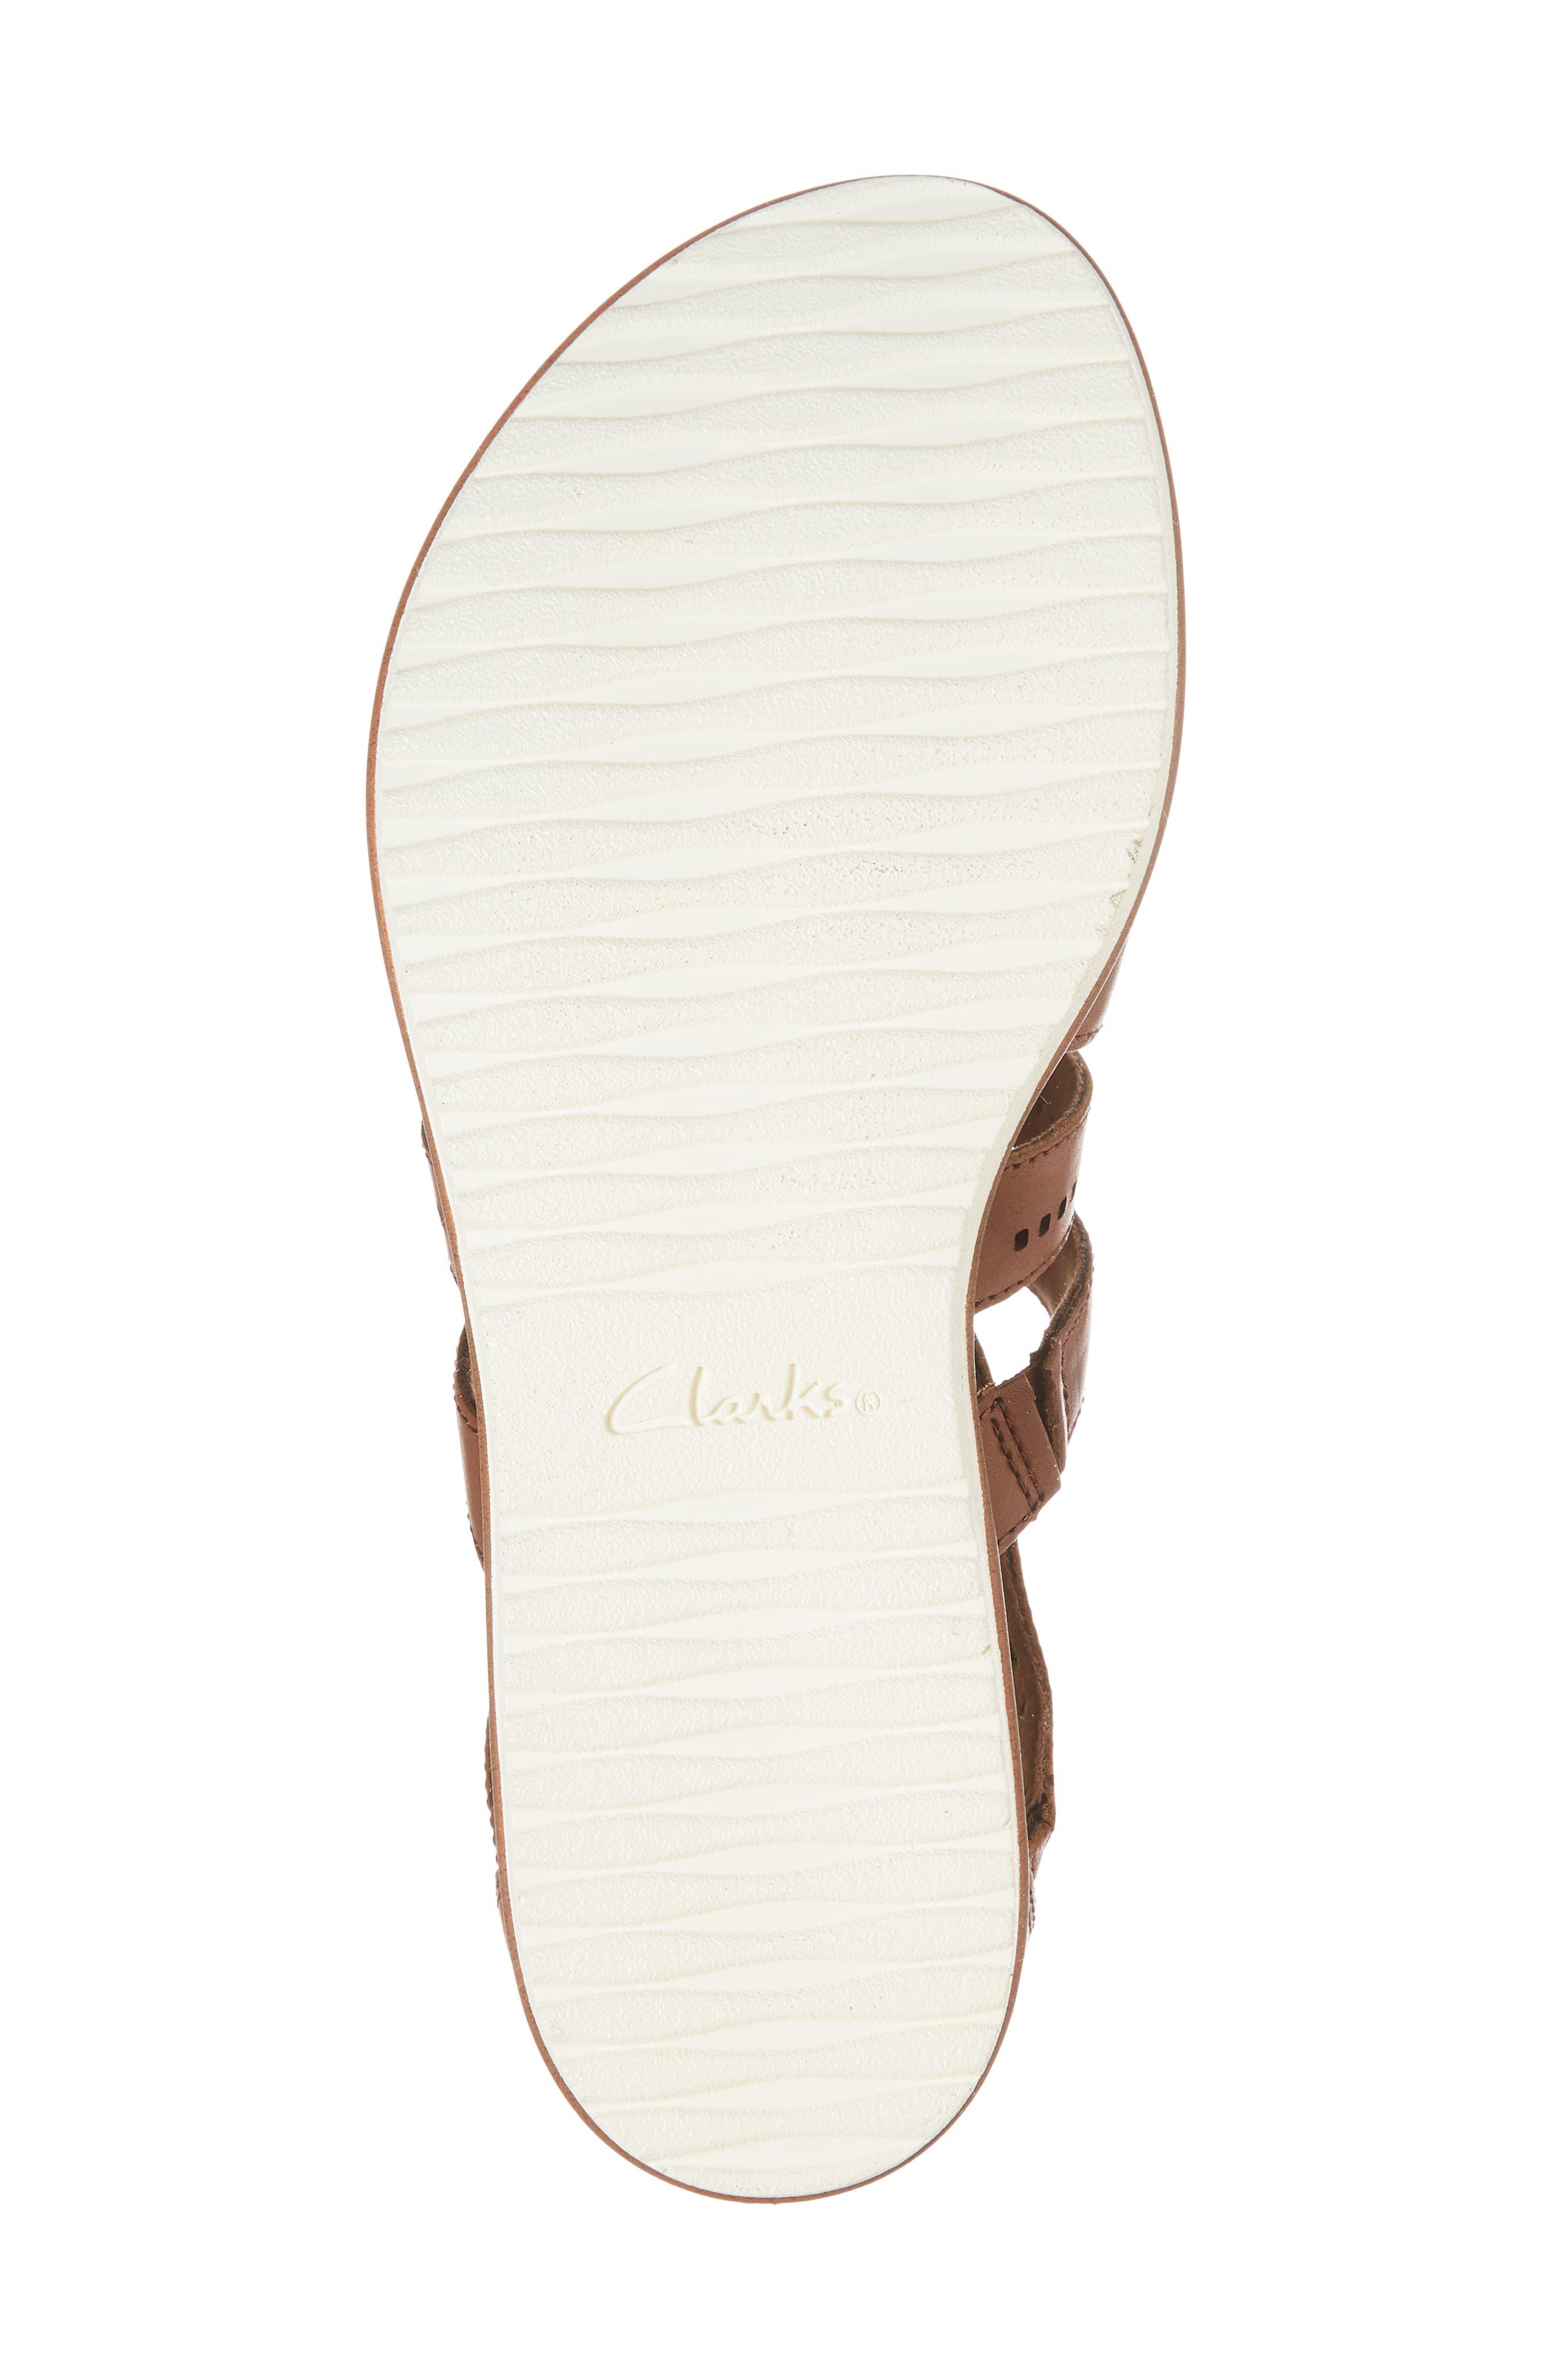 CLARKS<SUP>®</SUP>,                             Kele Lotus Sandal,                             Alternate thumbnail 6, color,                             250